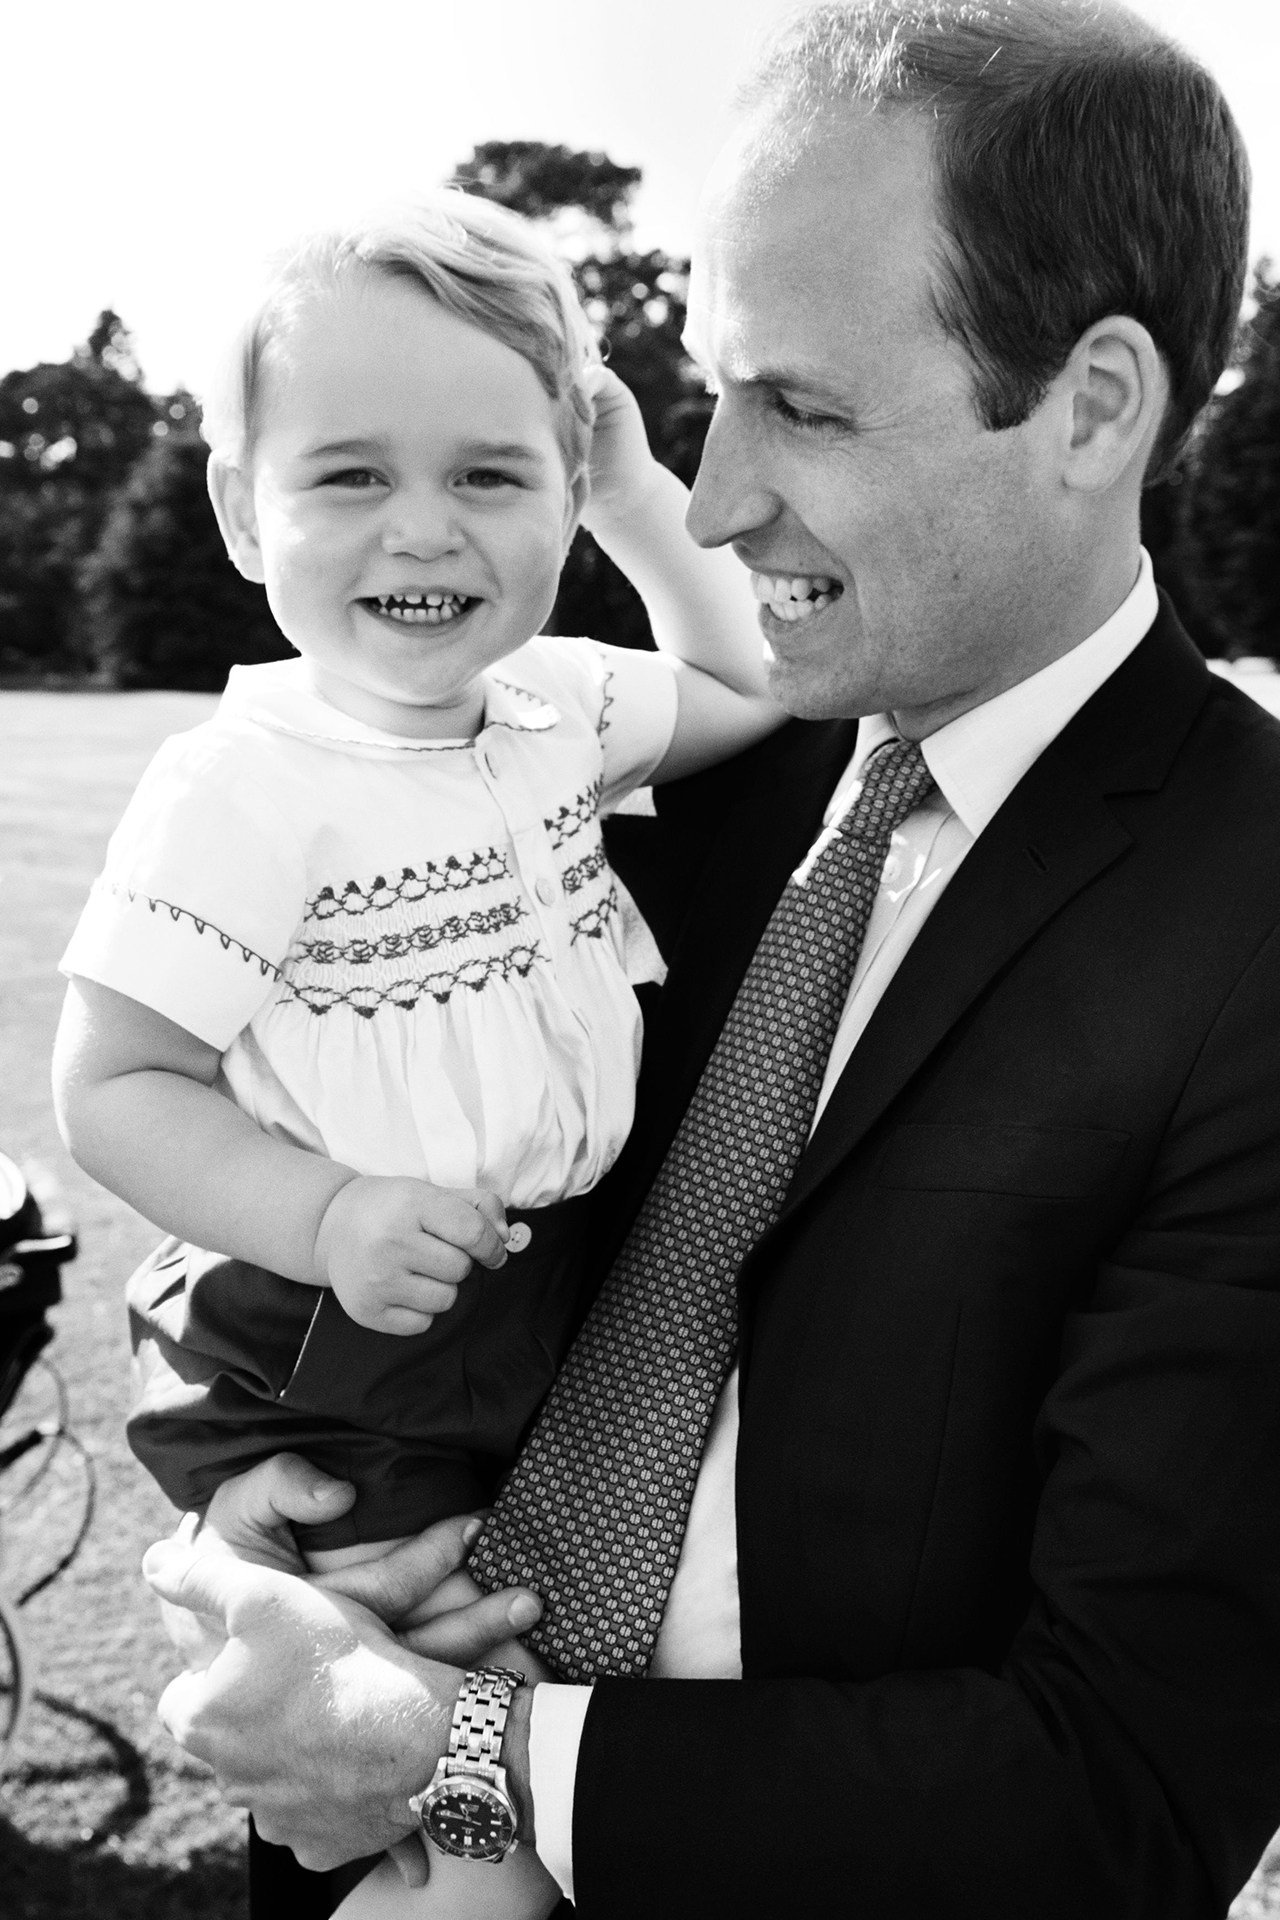 Following his third birthday, look back inside the Prince George photo album https://t.co/LQq6Kk8MNM https://t.co/bfckfvduJf